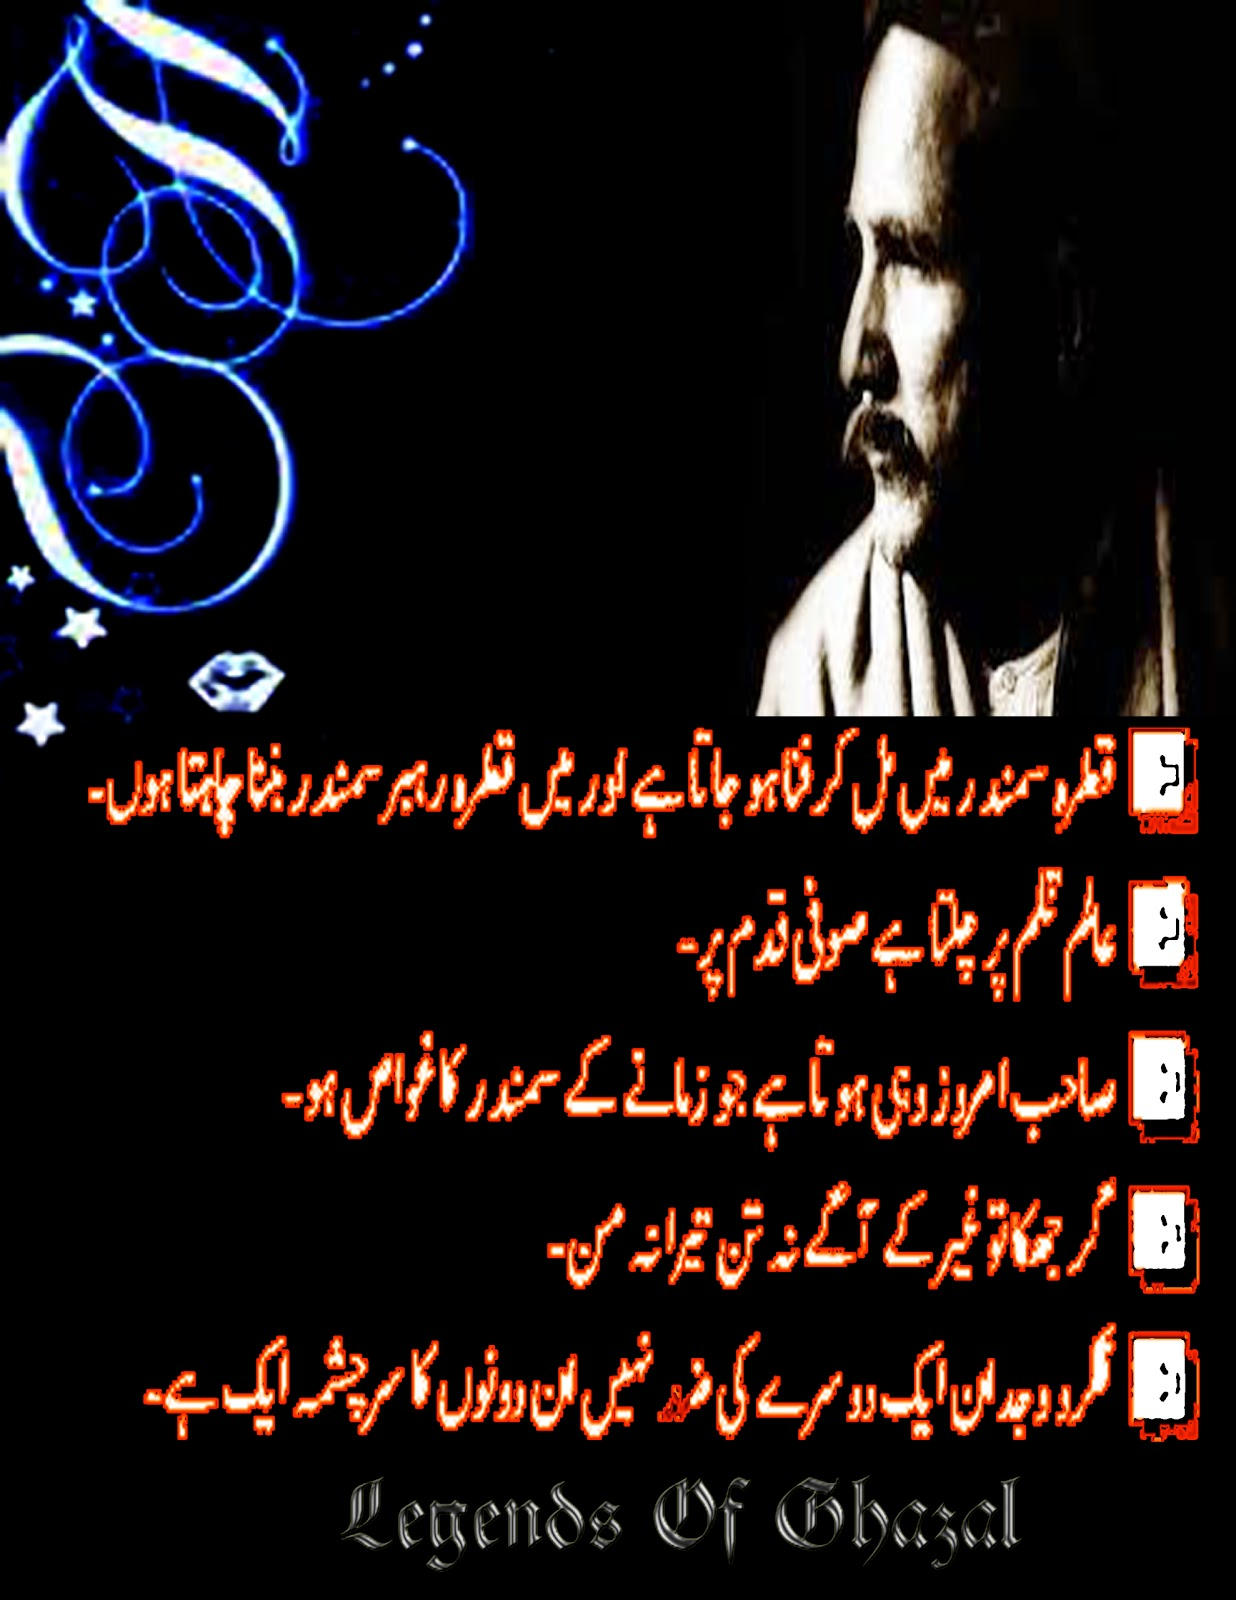 Legends Of Ghazal: Allama Iqbal - Quotes